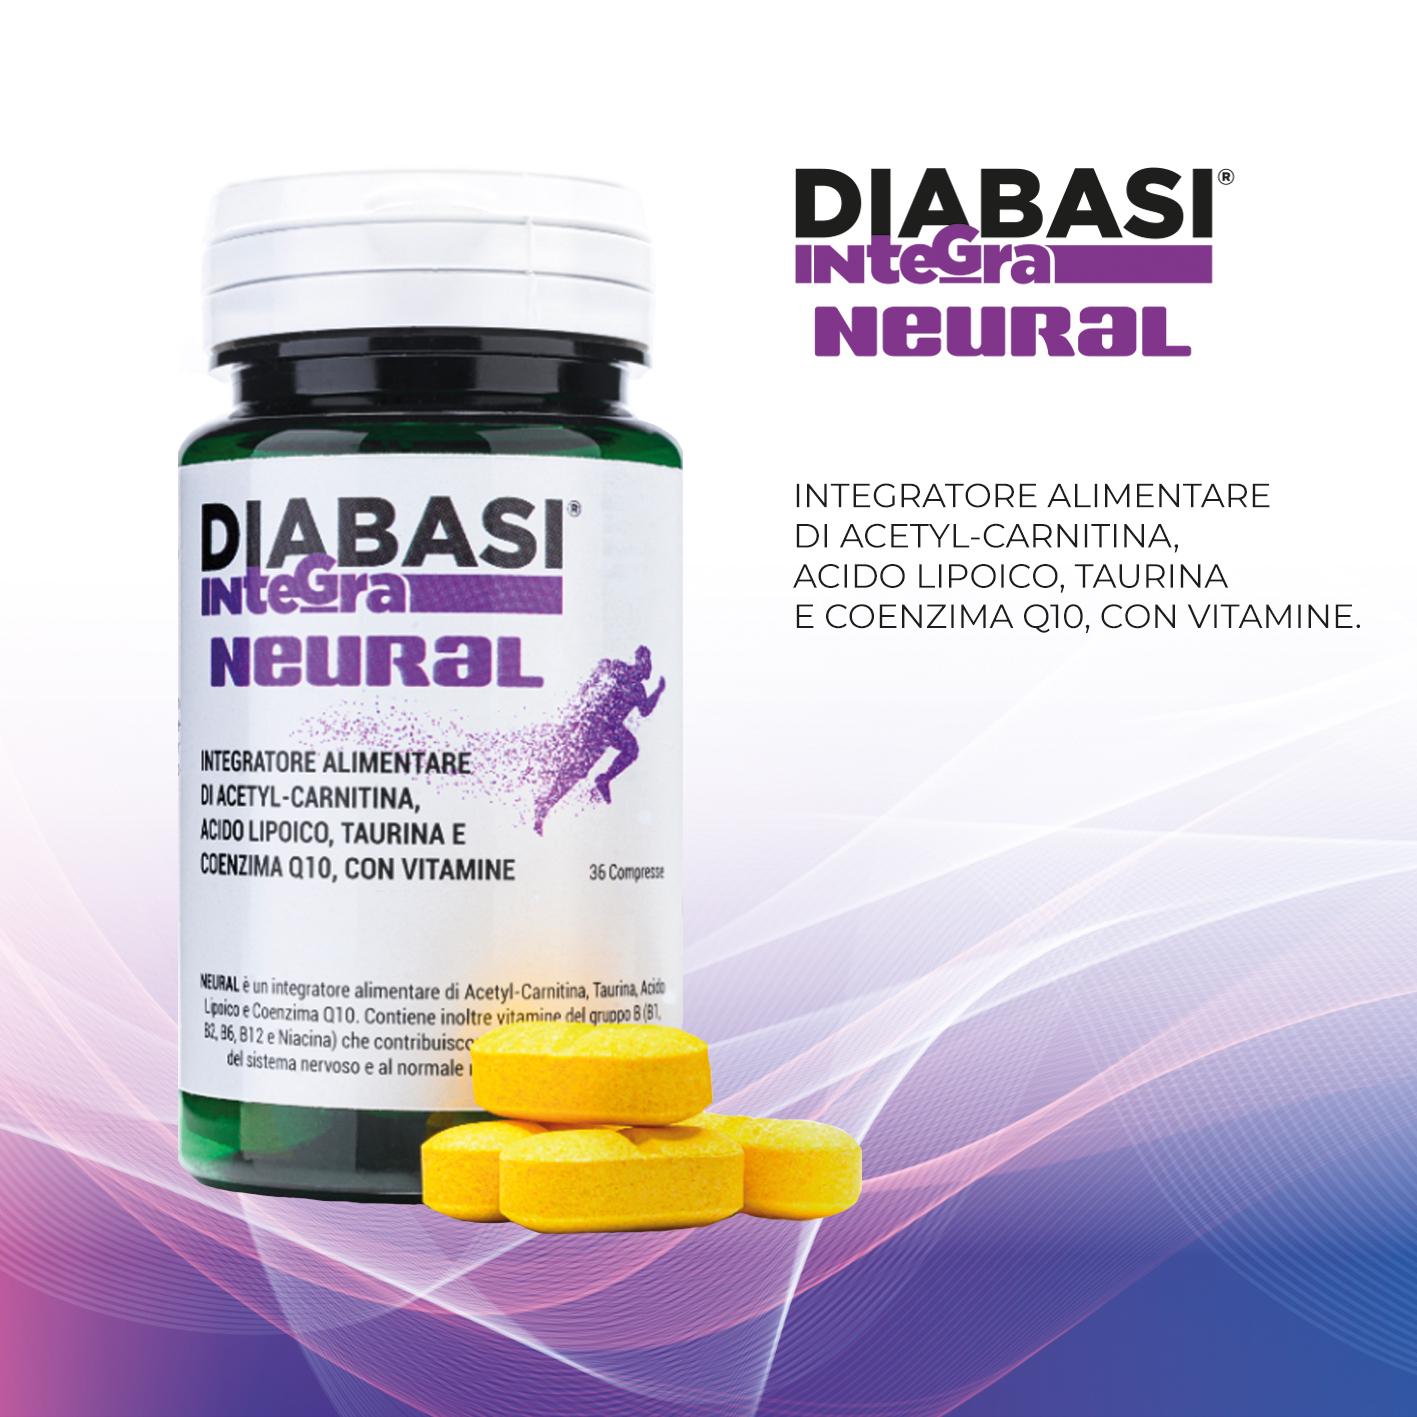 DIABASI INTEGRA - NEURAL